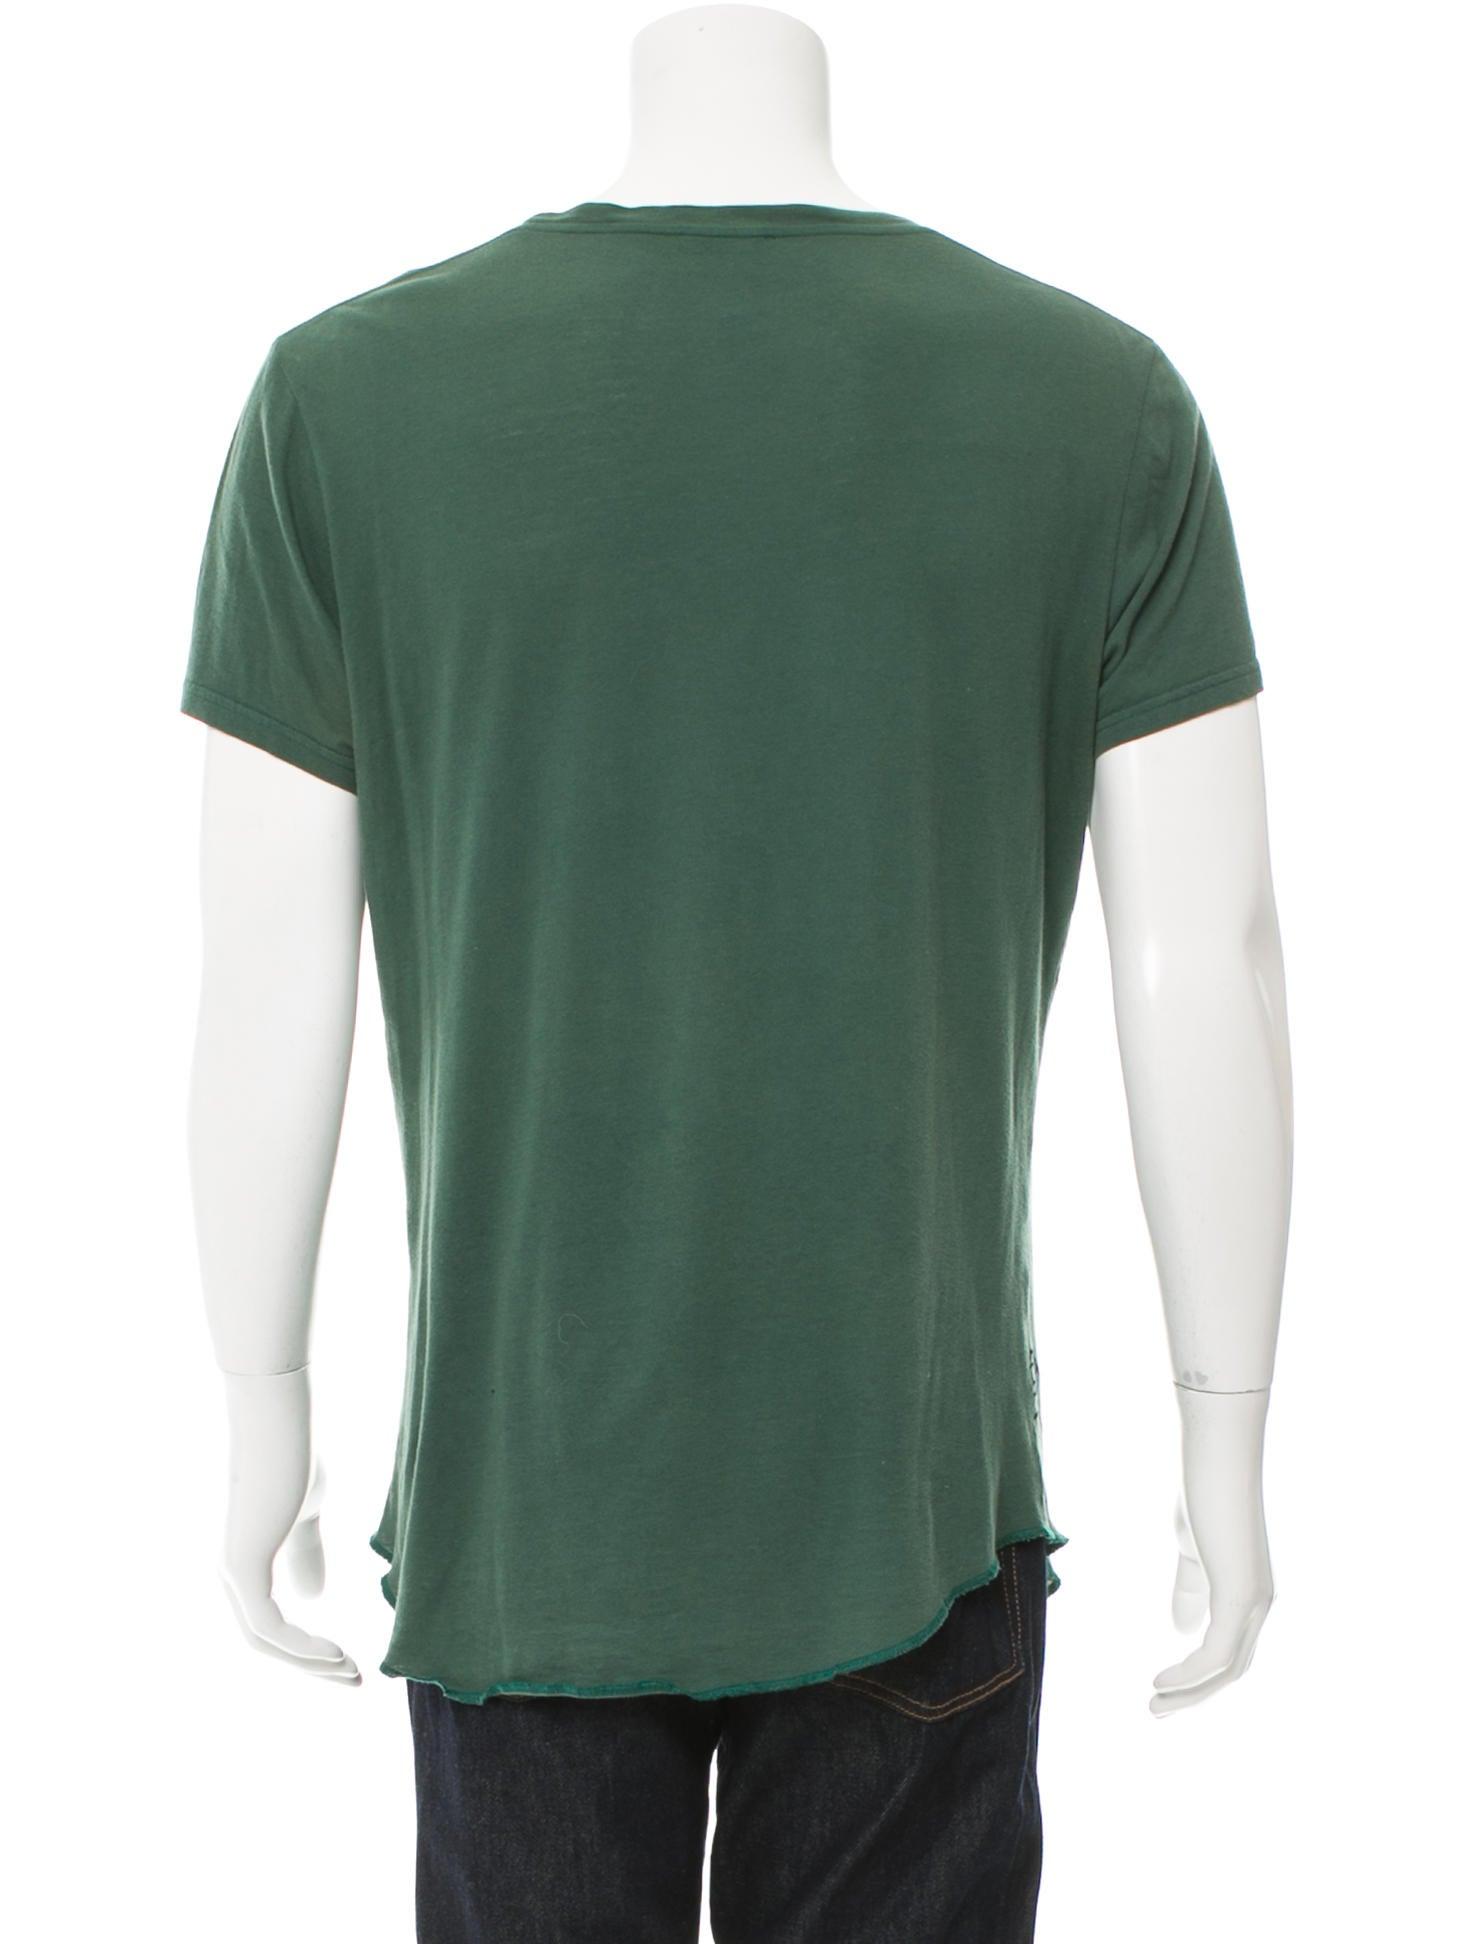 Balmain graphic scoop neck t shirt clothing bam24126 for Scoop neck t shirt